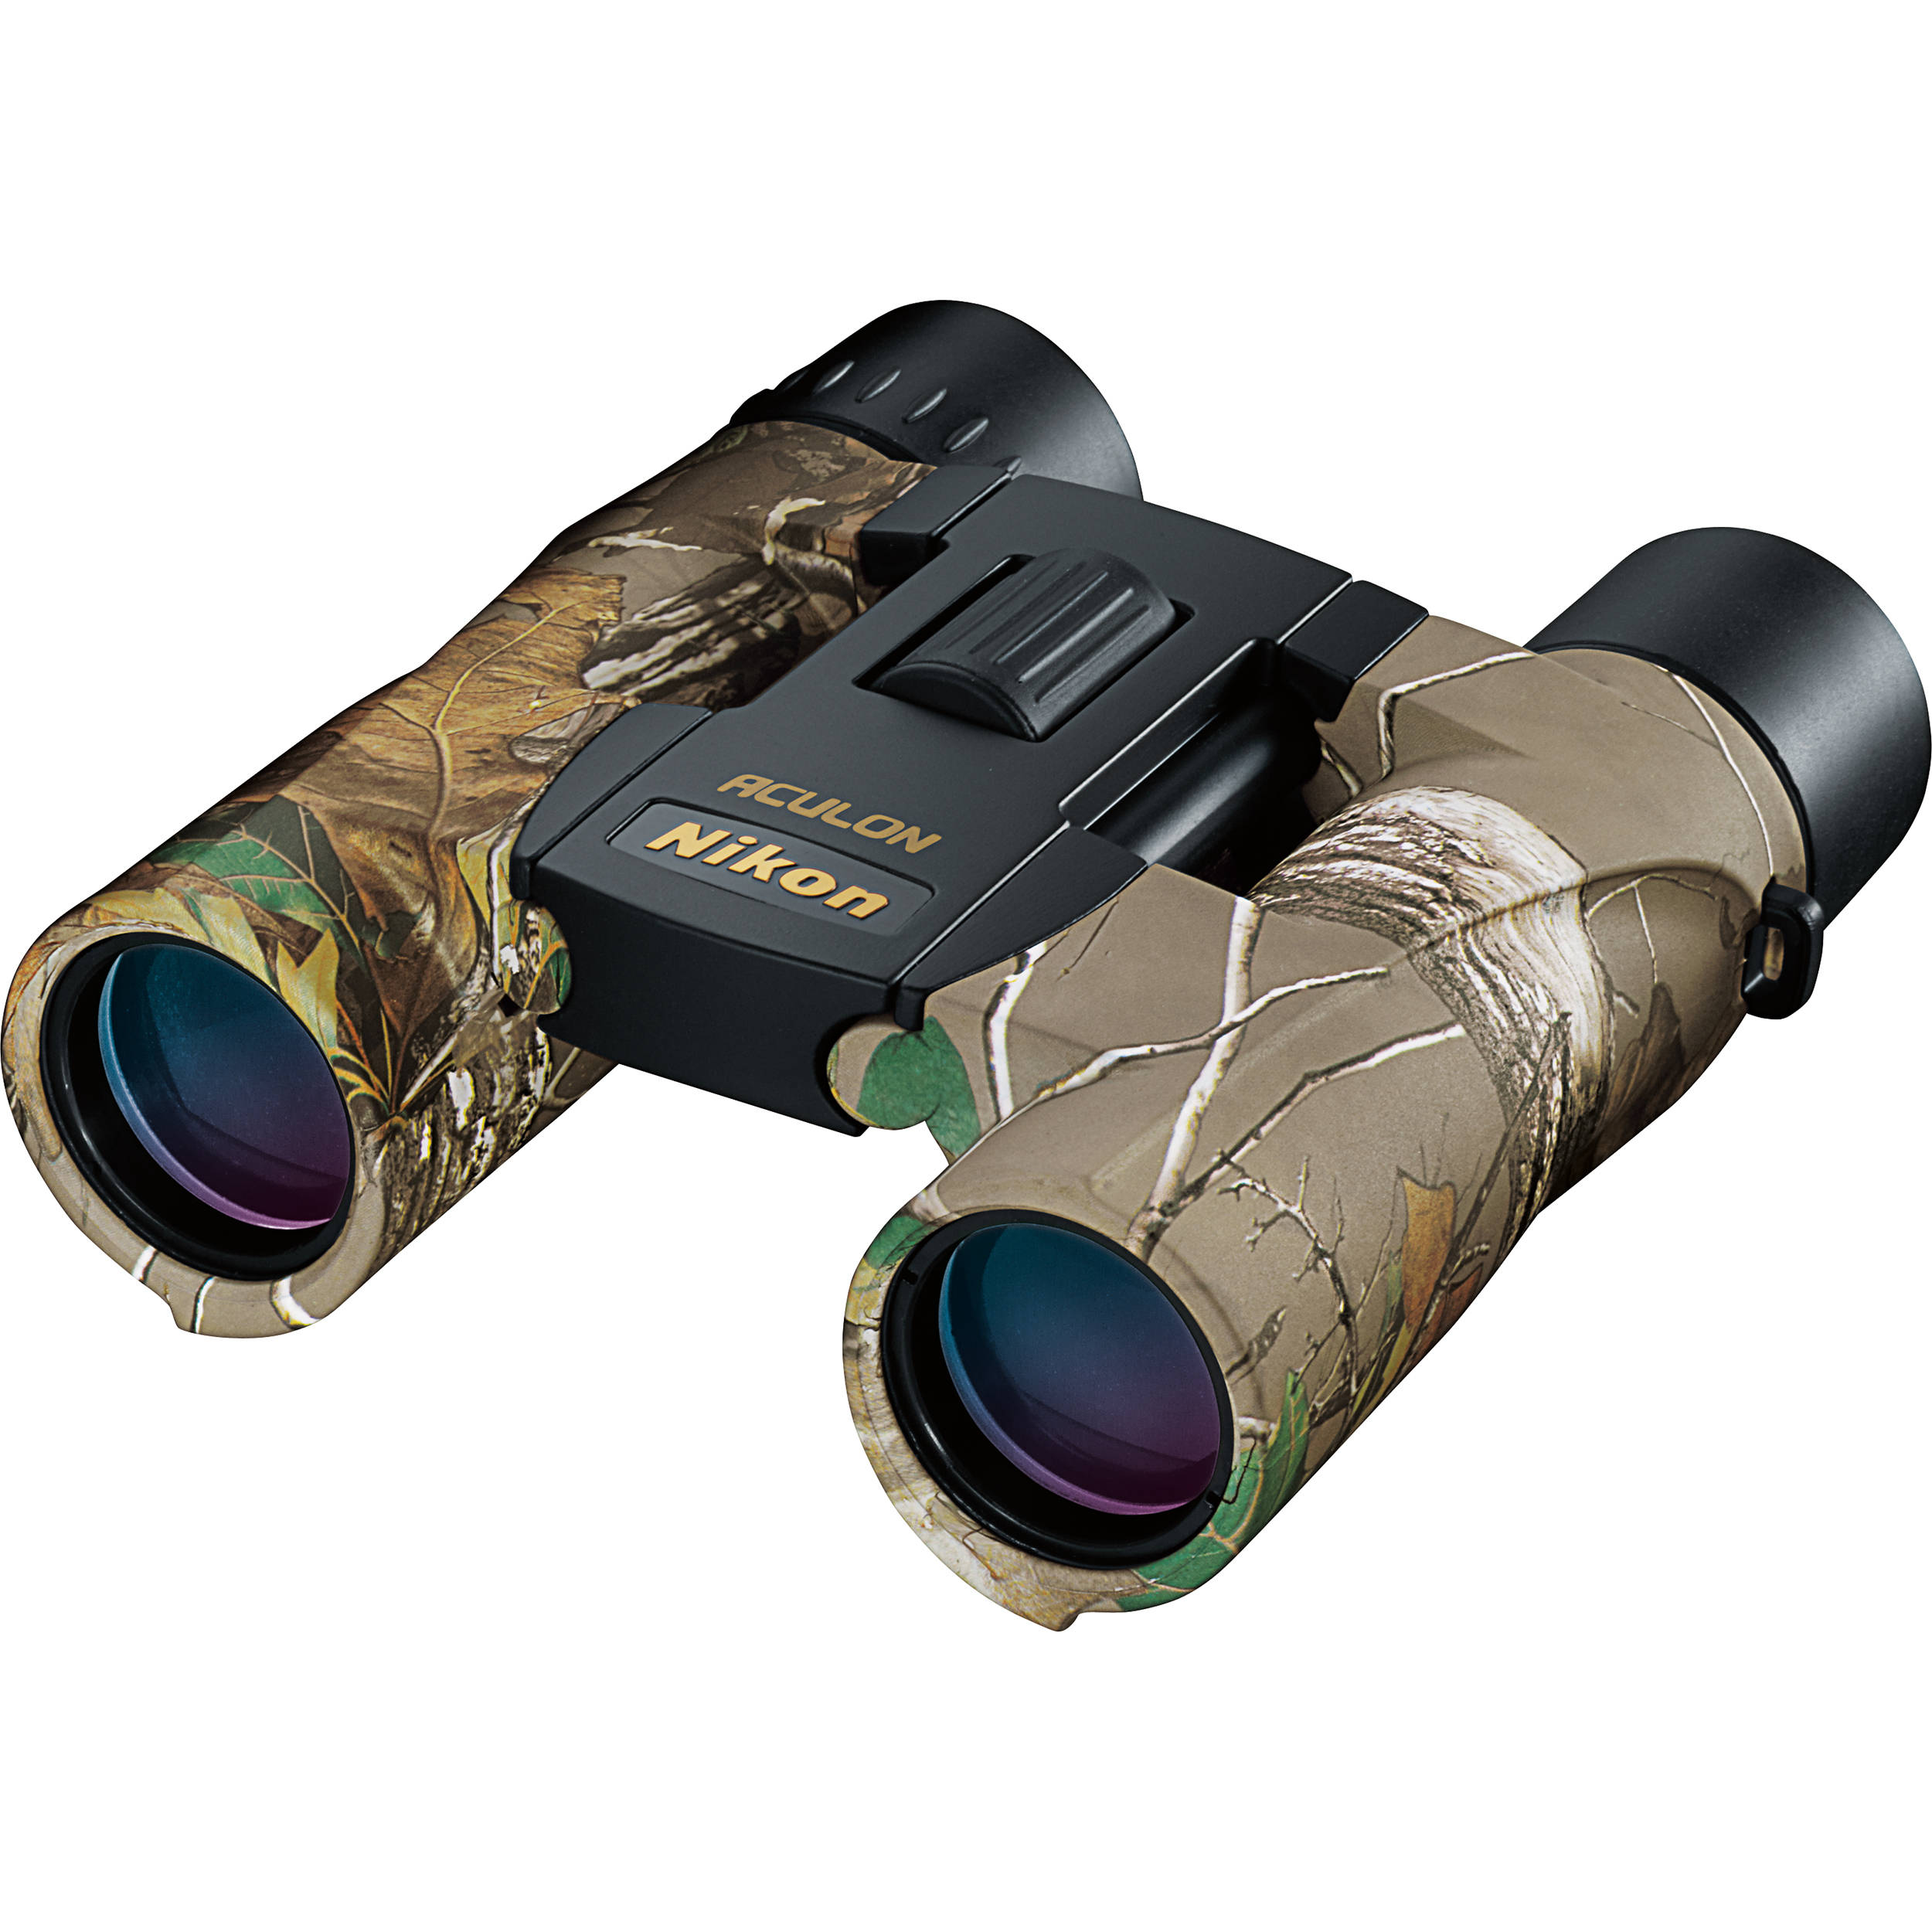 Nikon 10x25 Aculon A30 Binocular Realtree Camo 8264 B Amp H